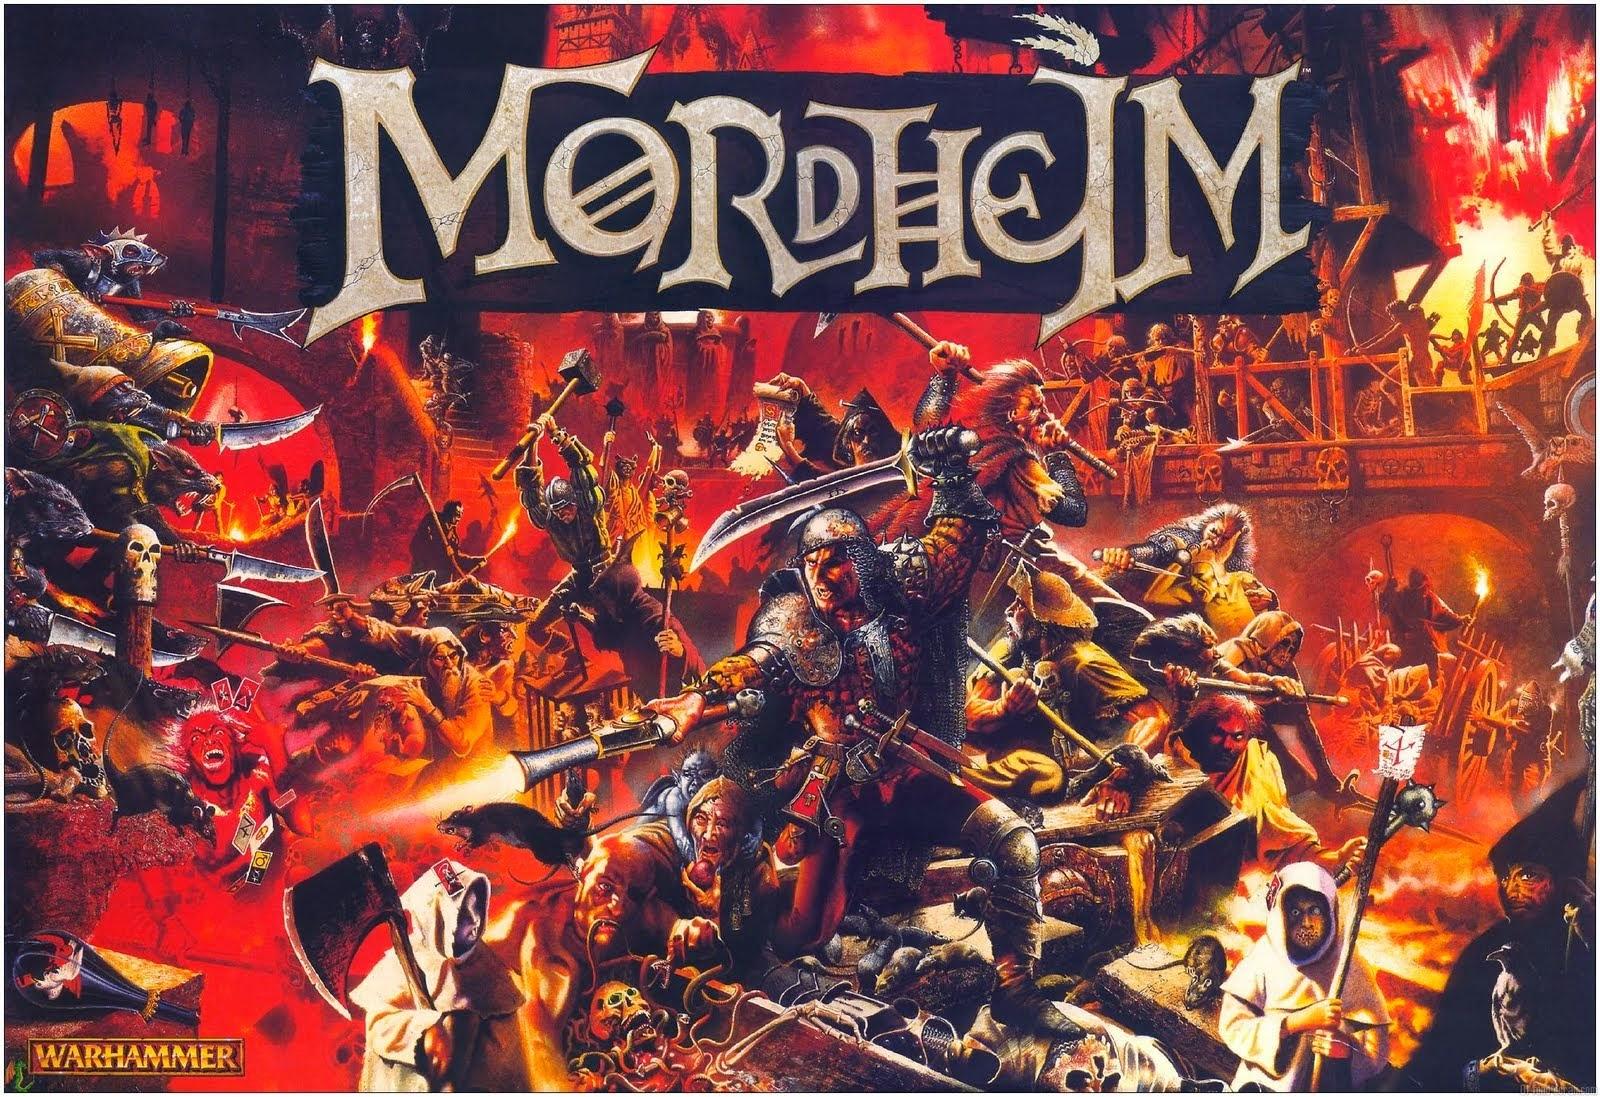 Portada de la caja de Mordheim